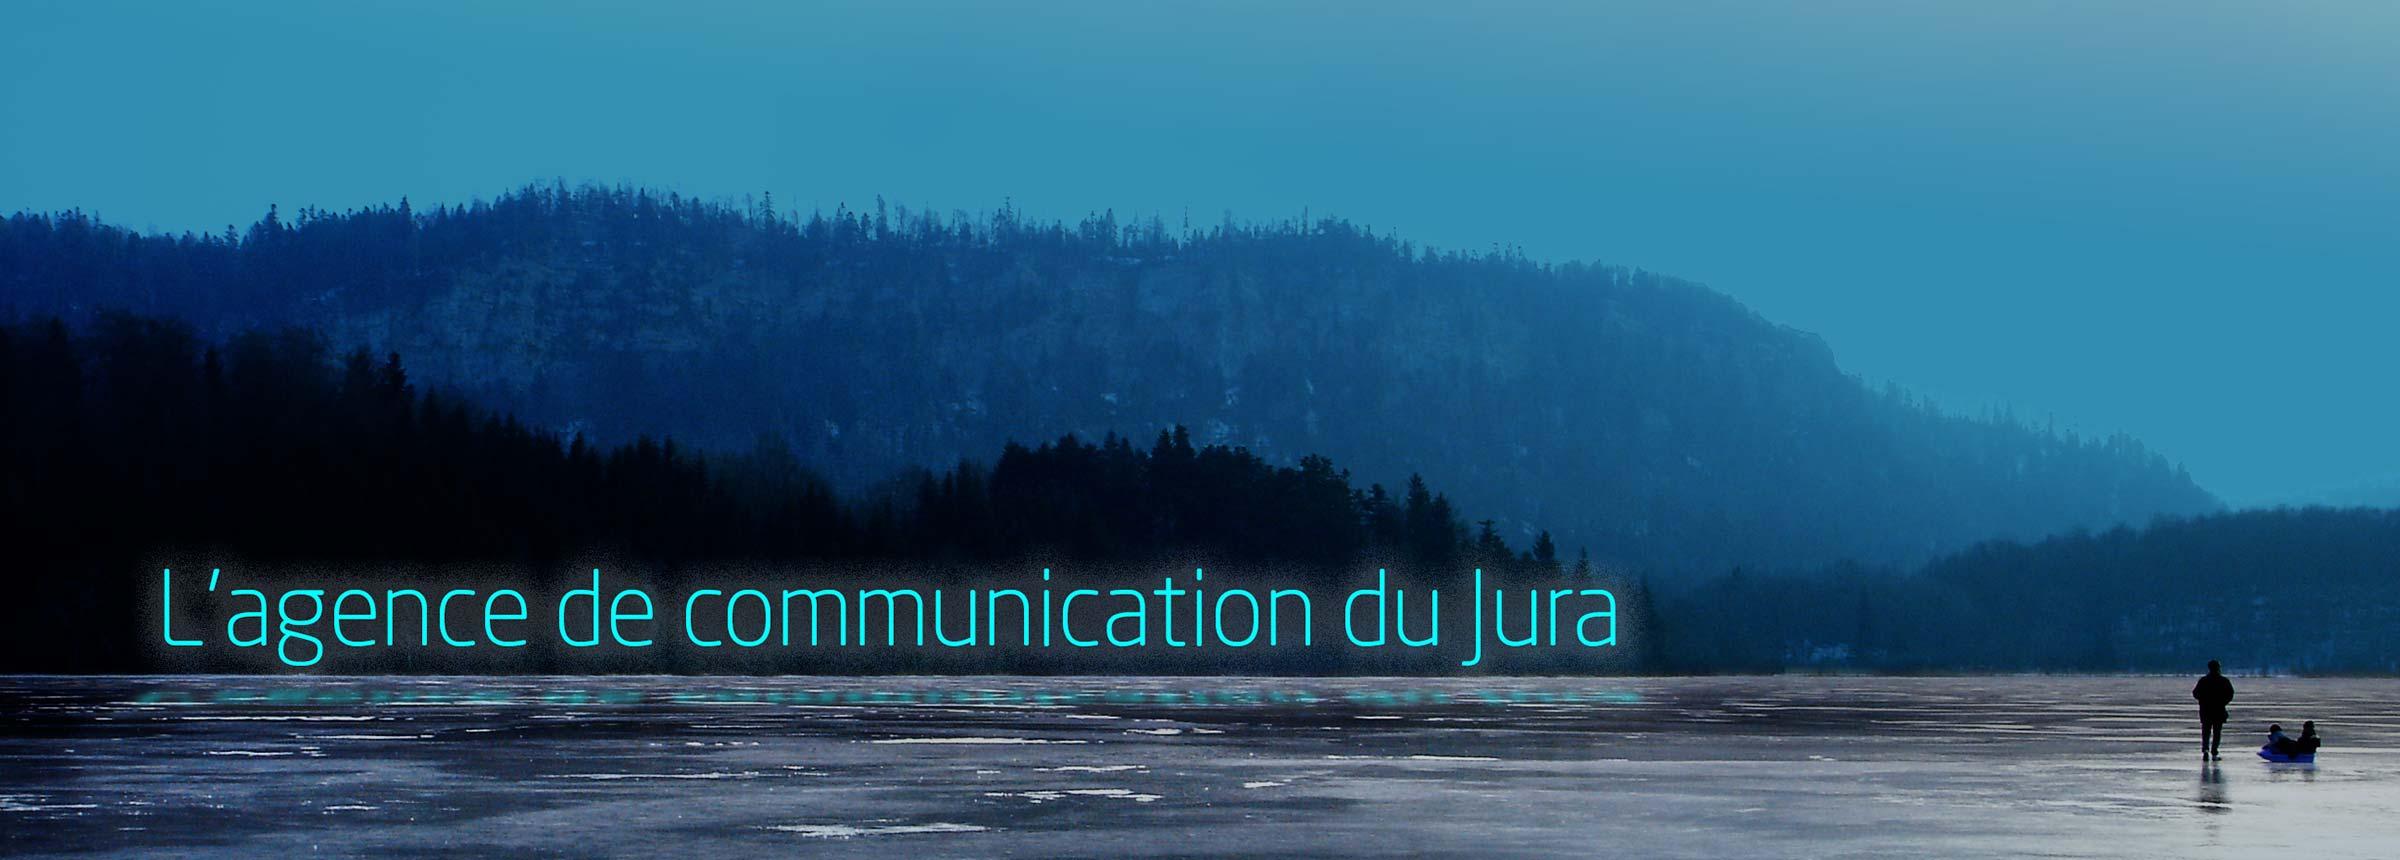 L'agence de communication du Jura (39)